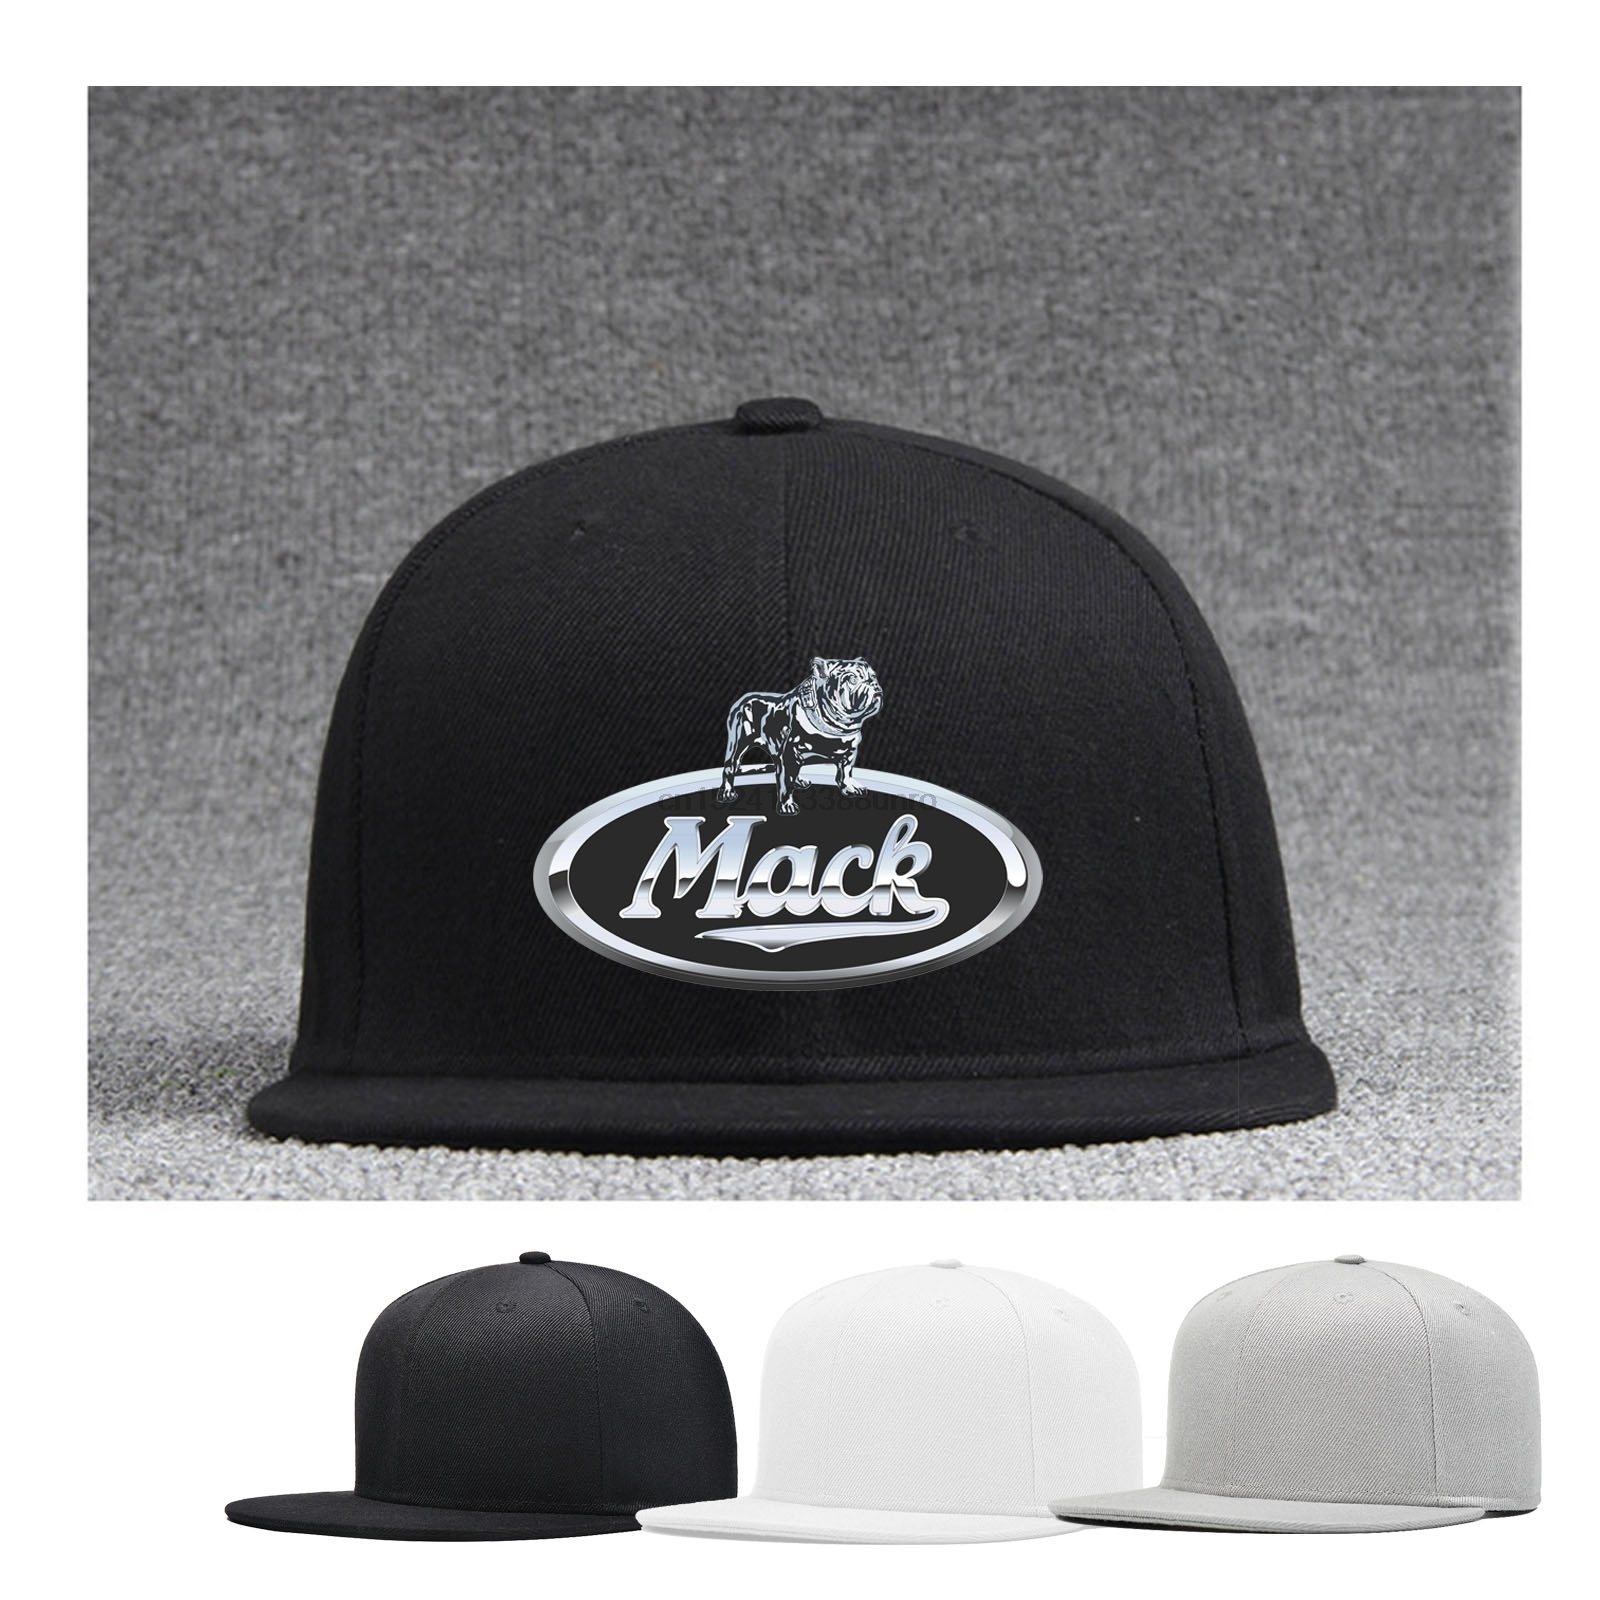 88b27abd3ee628 Detail Feedback Questions about Mack Trucks Trucker Print Hip Hop Caps Hats  Cotton Hat Adjustable Cap Snapback Hat Unisex Men Women Hat Youth Hat  Street Cap ...